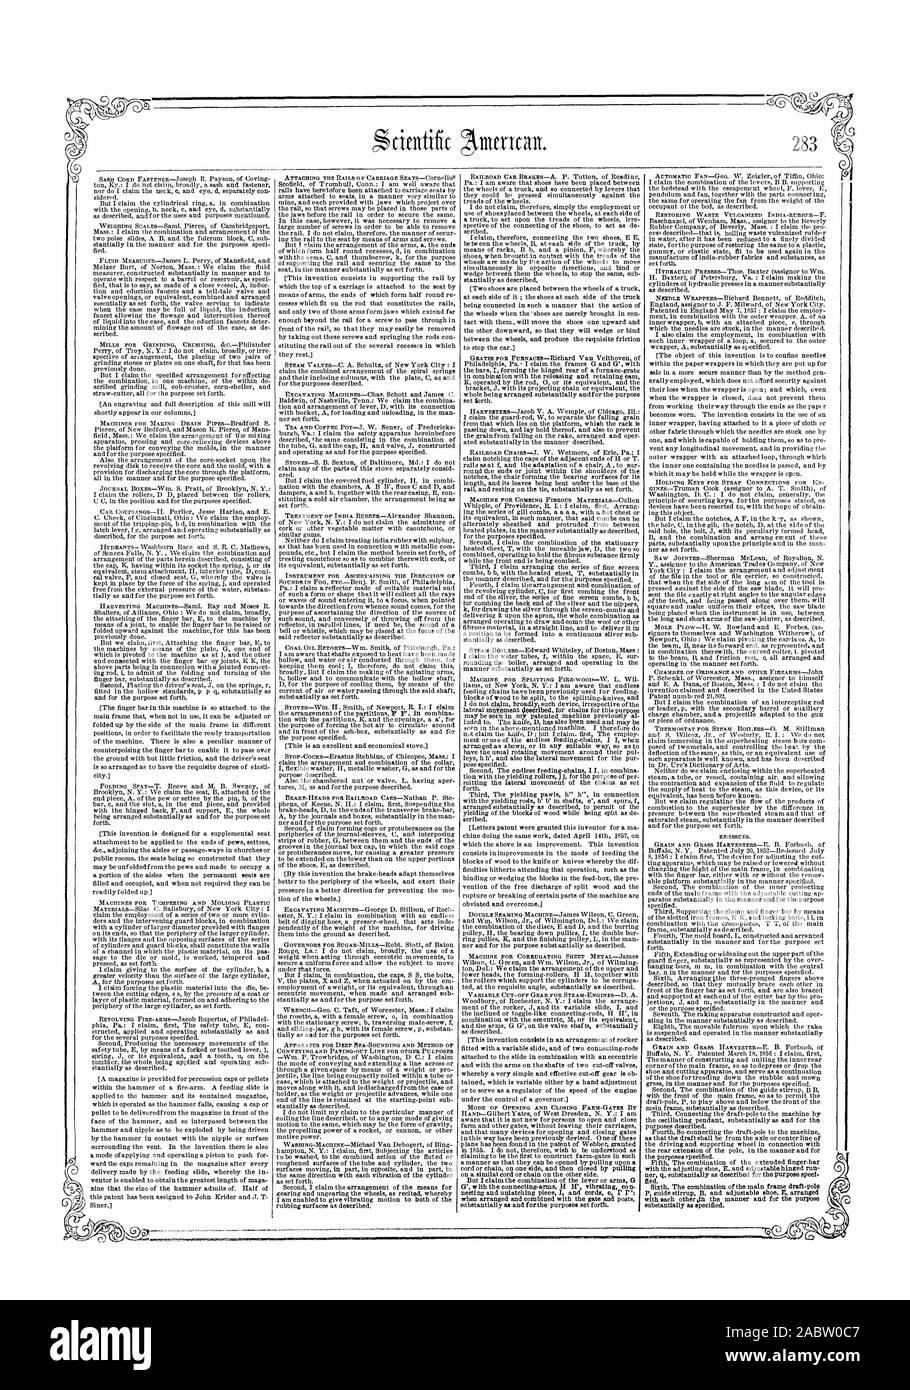 ze`, scientific american, 1859-04-30 Stock Photo